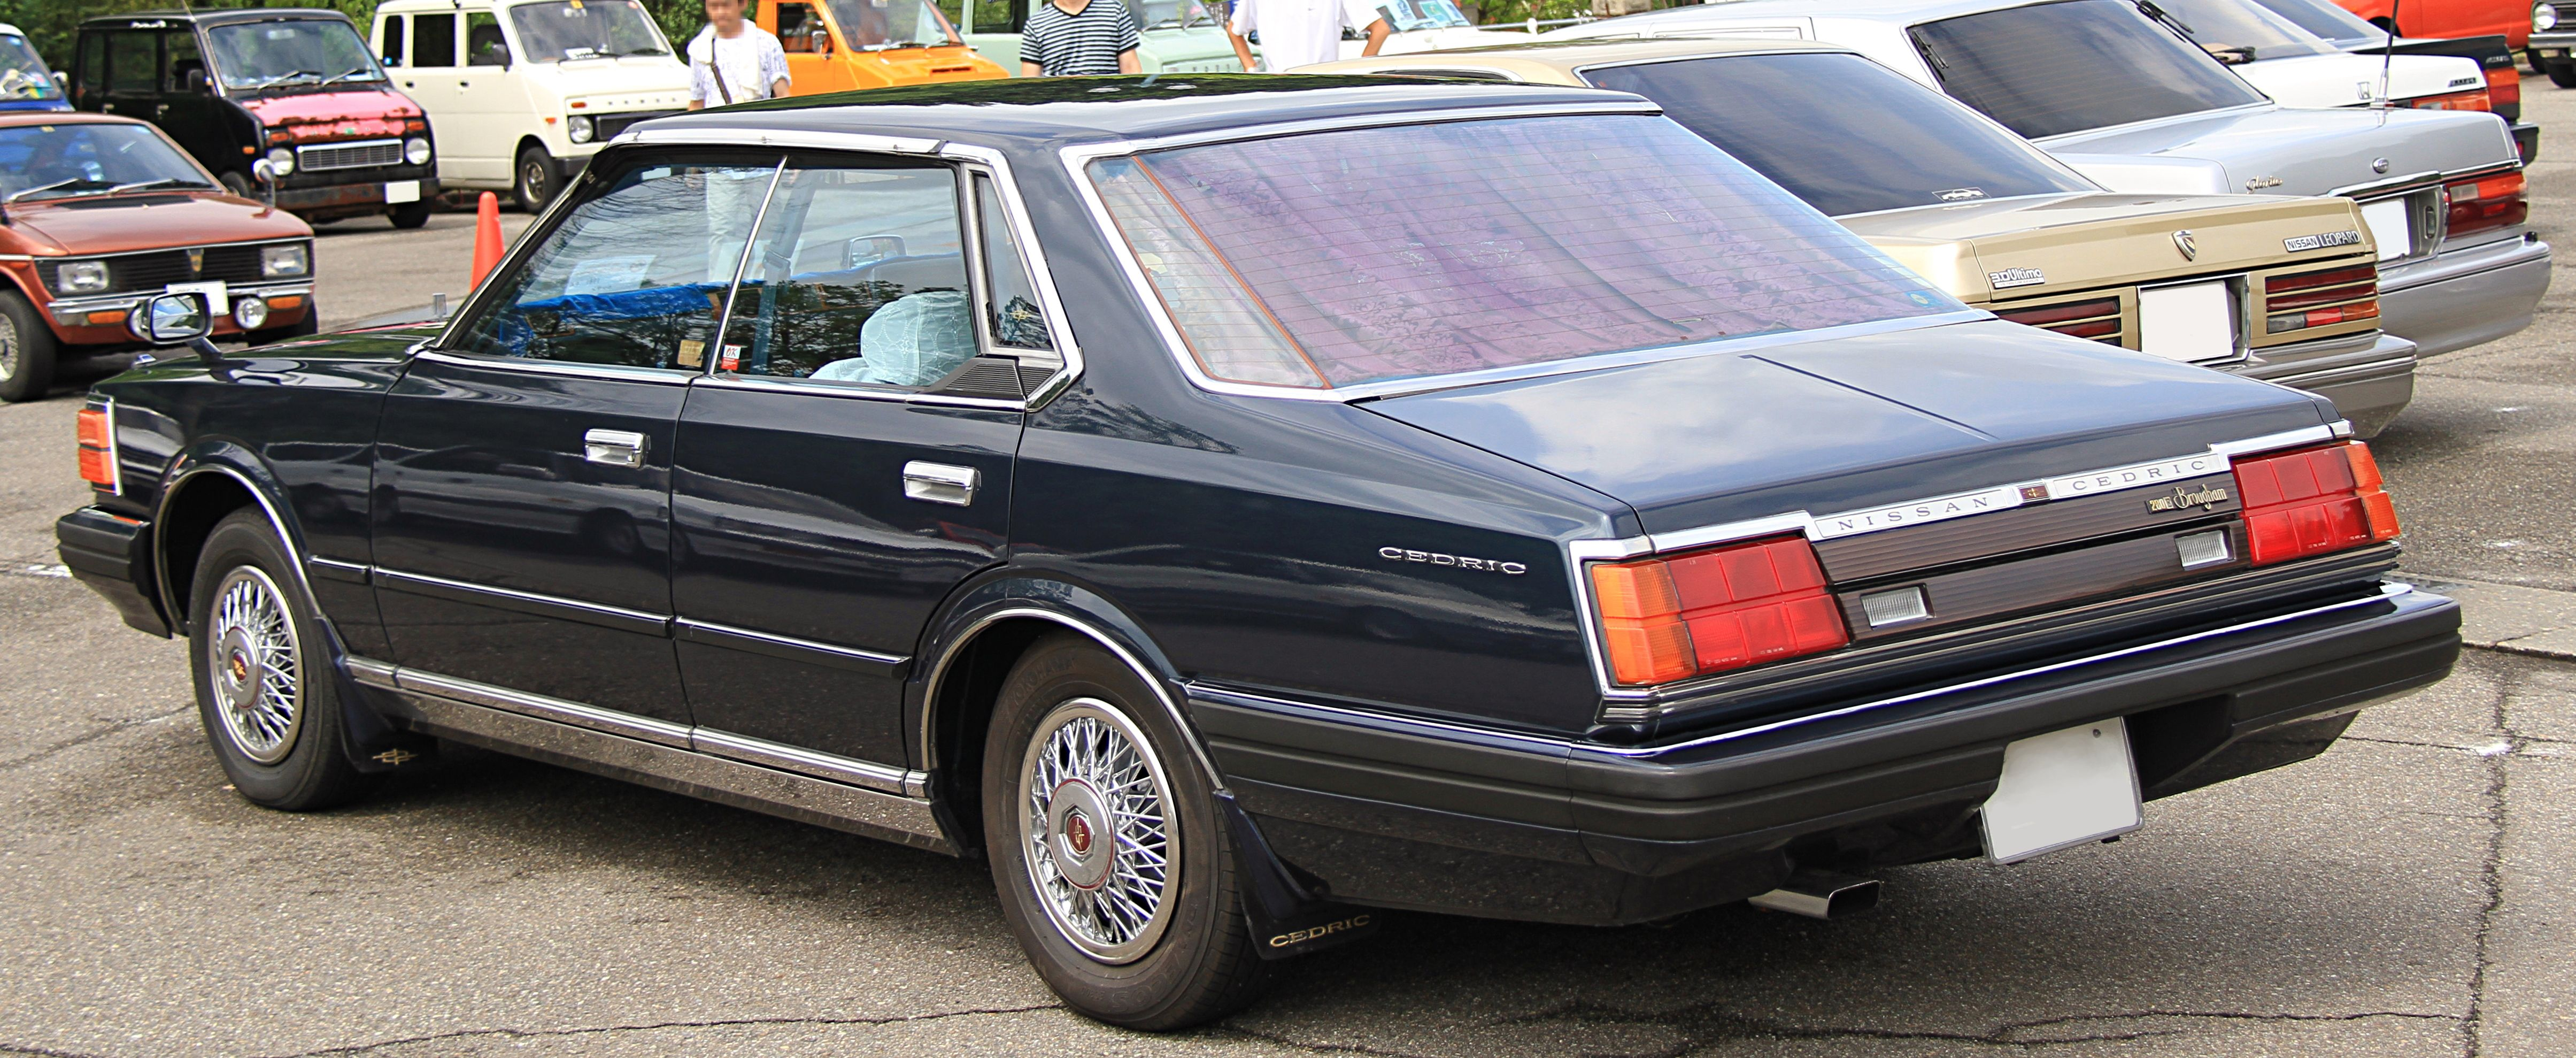 File 1981 Nissan Cedric Hardtop 2800 Brougham Jpg